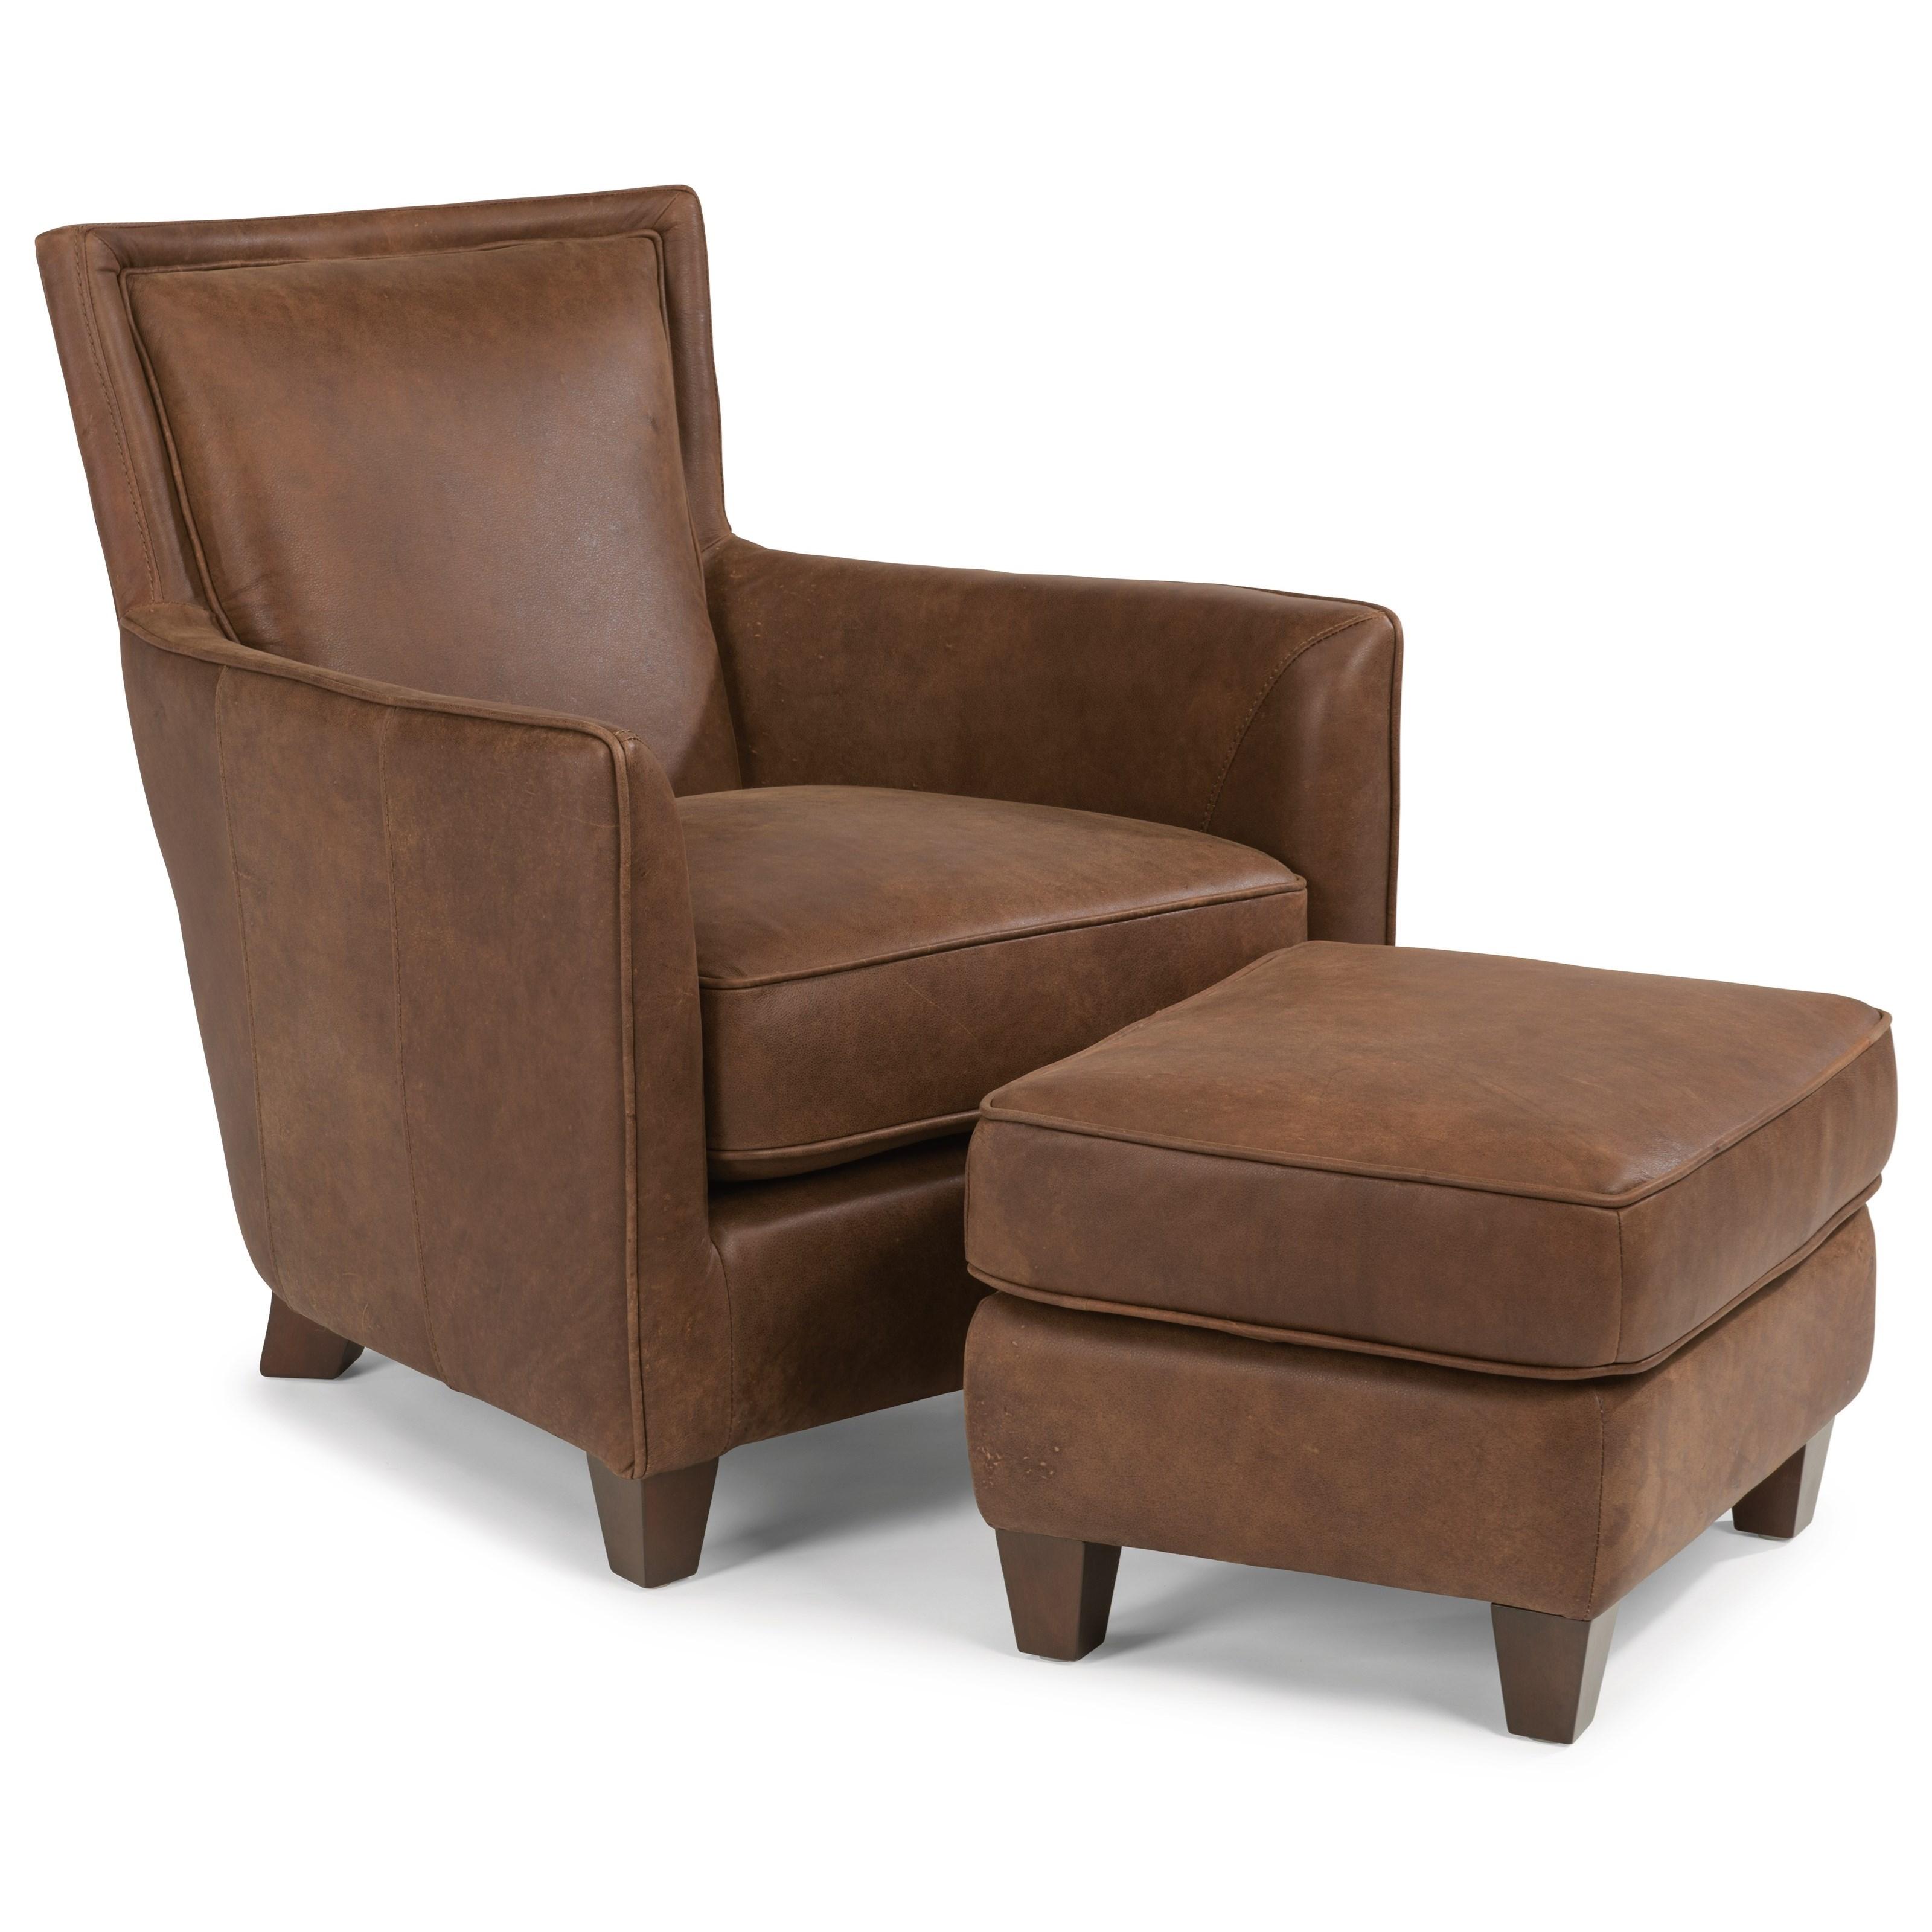 Flexsteel Latitudes Kingston Contemporary Leather Chair